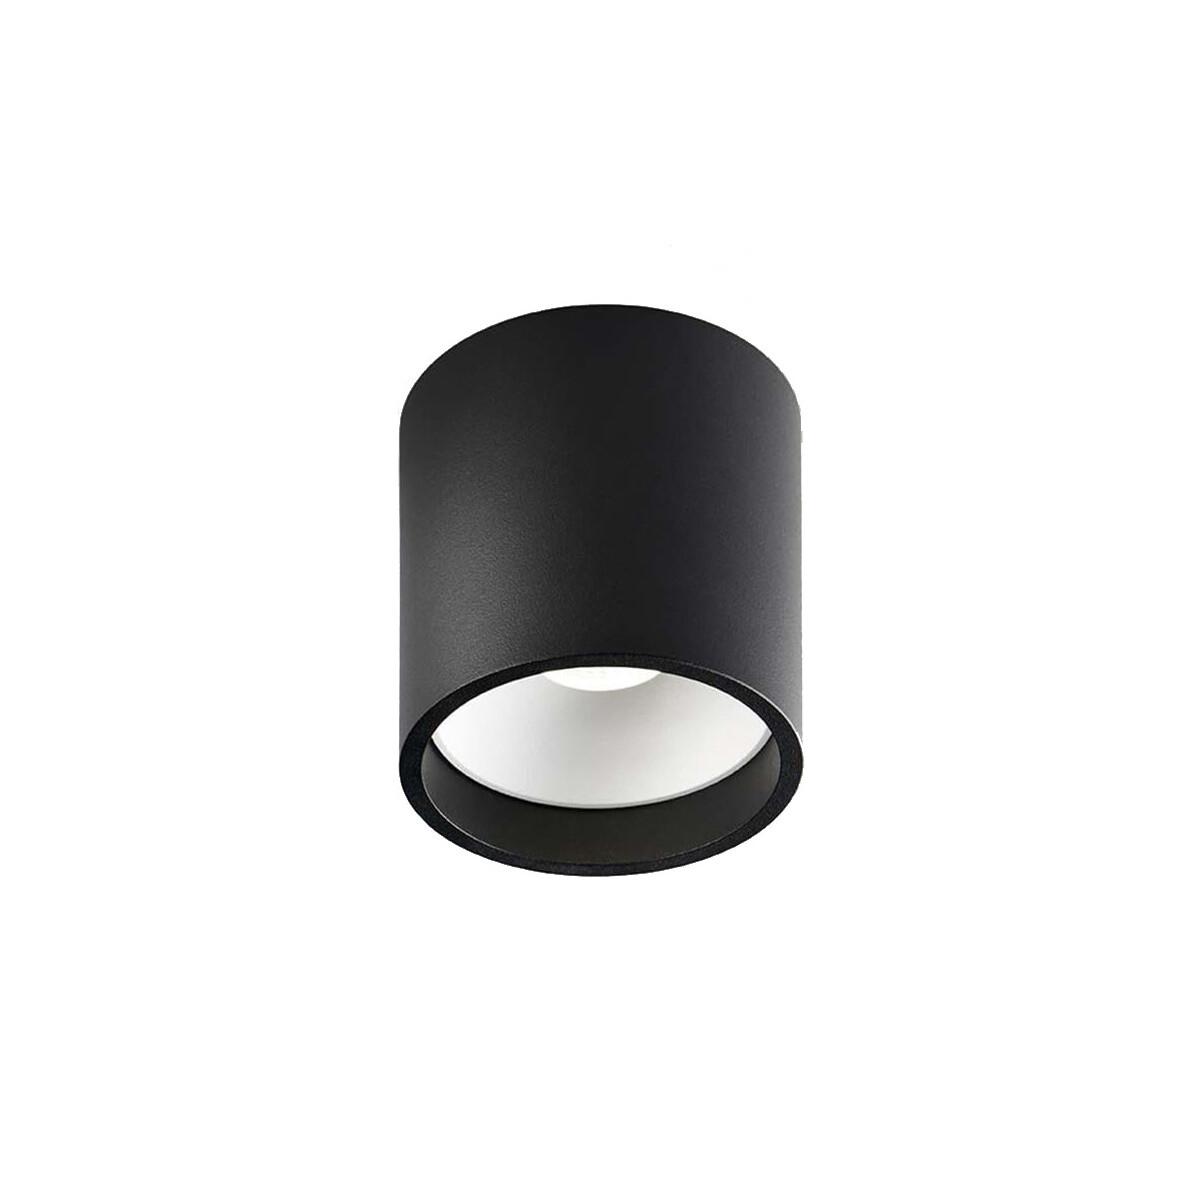 Solo Round LED Loftlampe 2700K Sort/Hvid – LIGHT-POINT